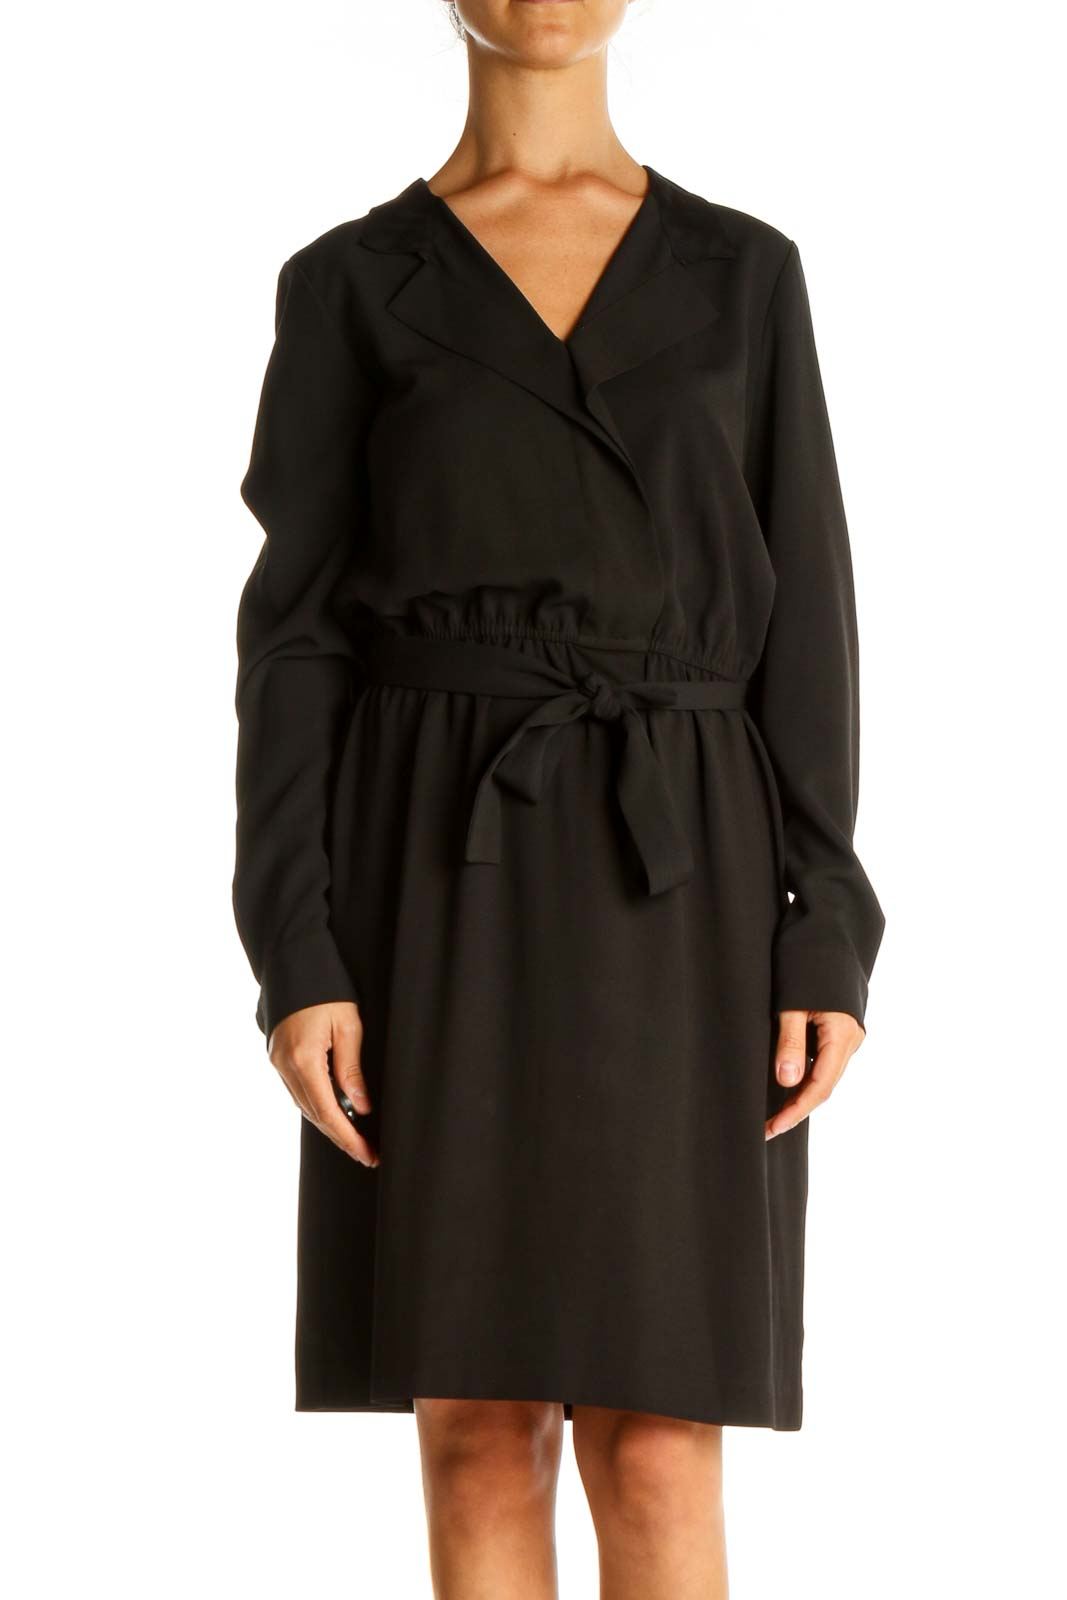 Black Solid Work Fit & Flare Dress Front